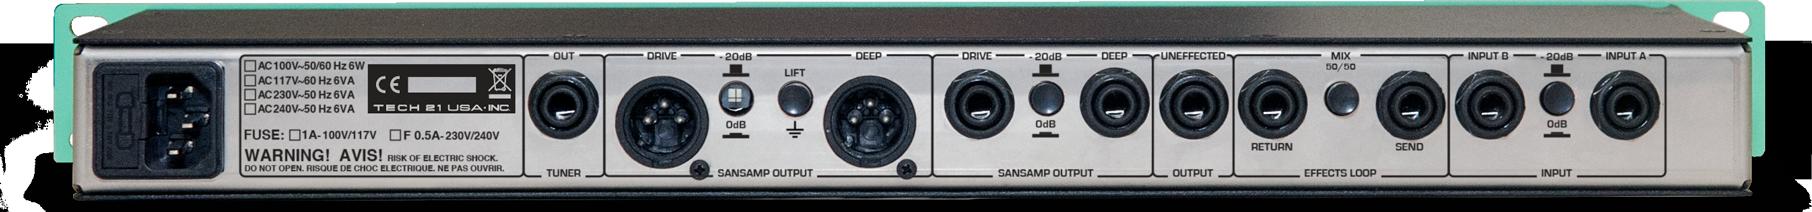 GED-2112 Rear Panel